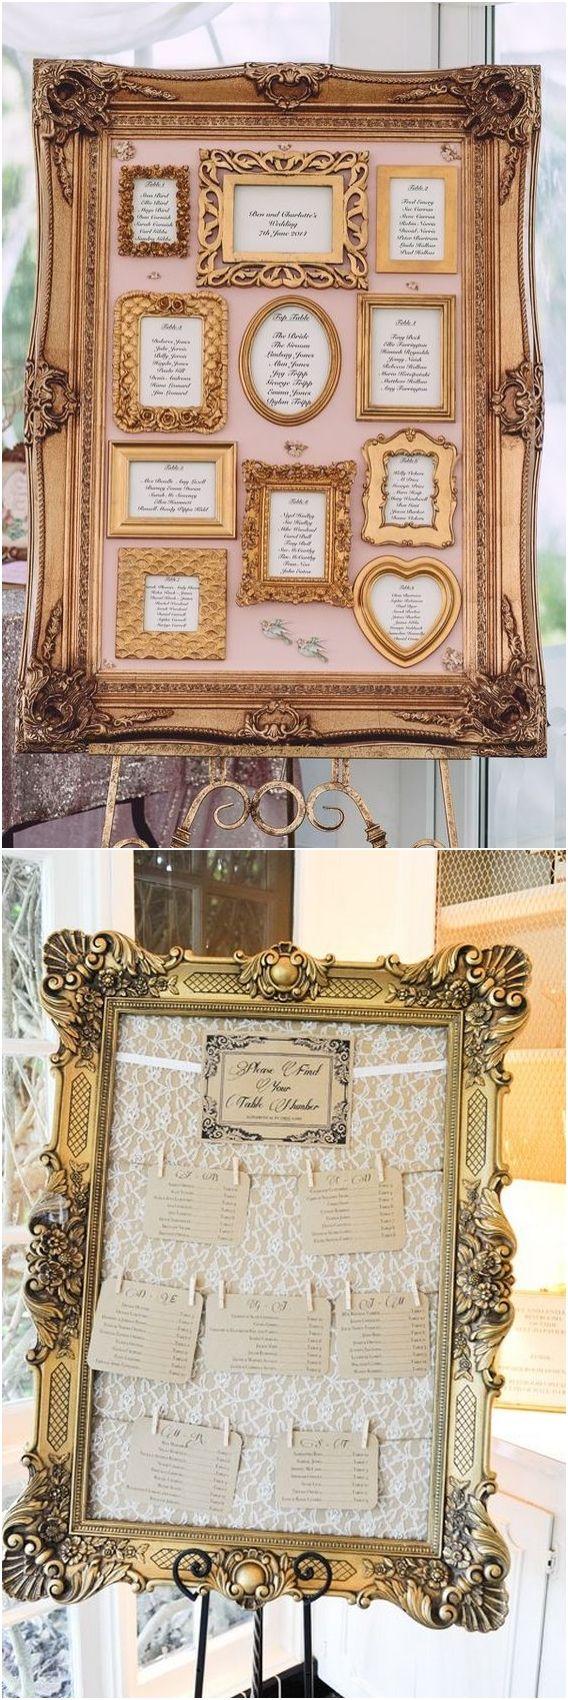 Vintage style wedding decoration ideas   Vintage Baroque Wedding Decor Ideas  SIGNSFrames u Mirrors for